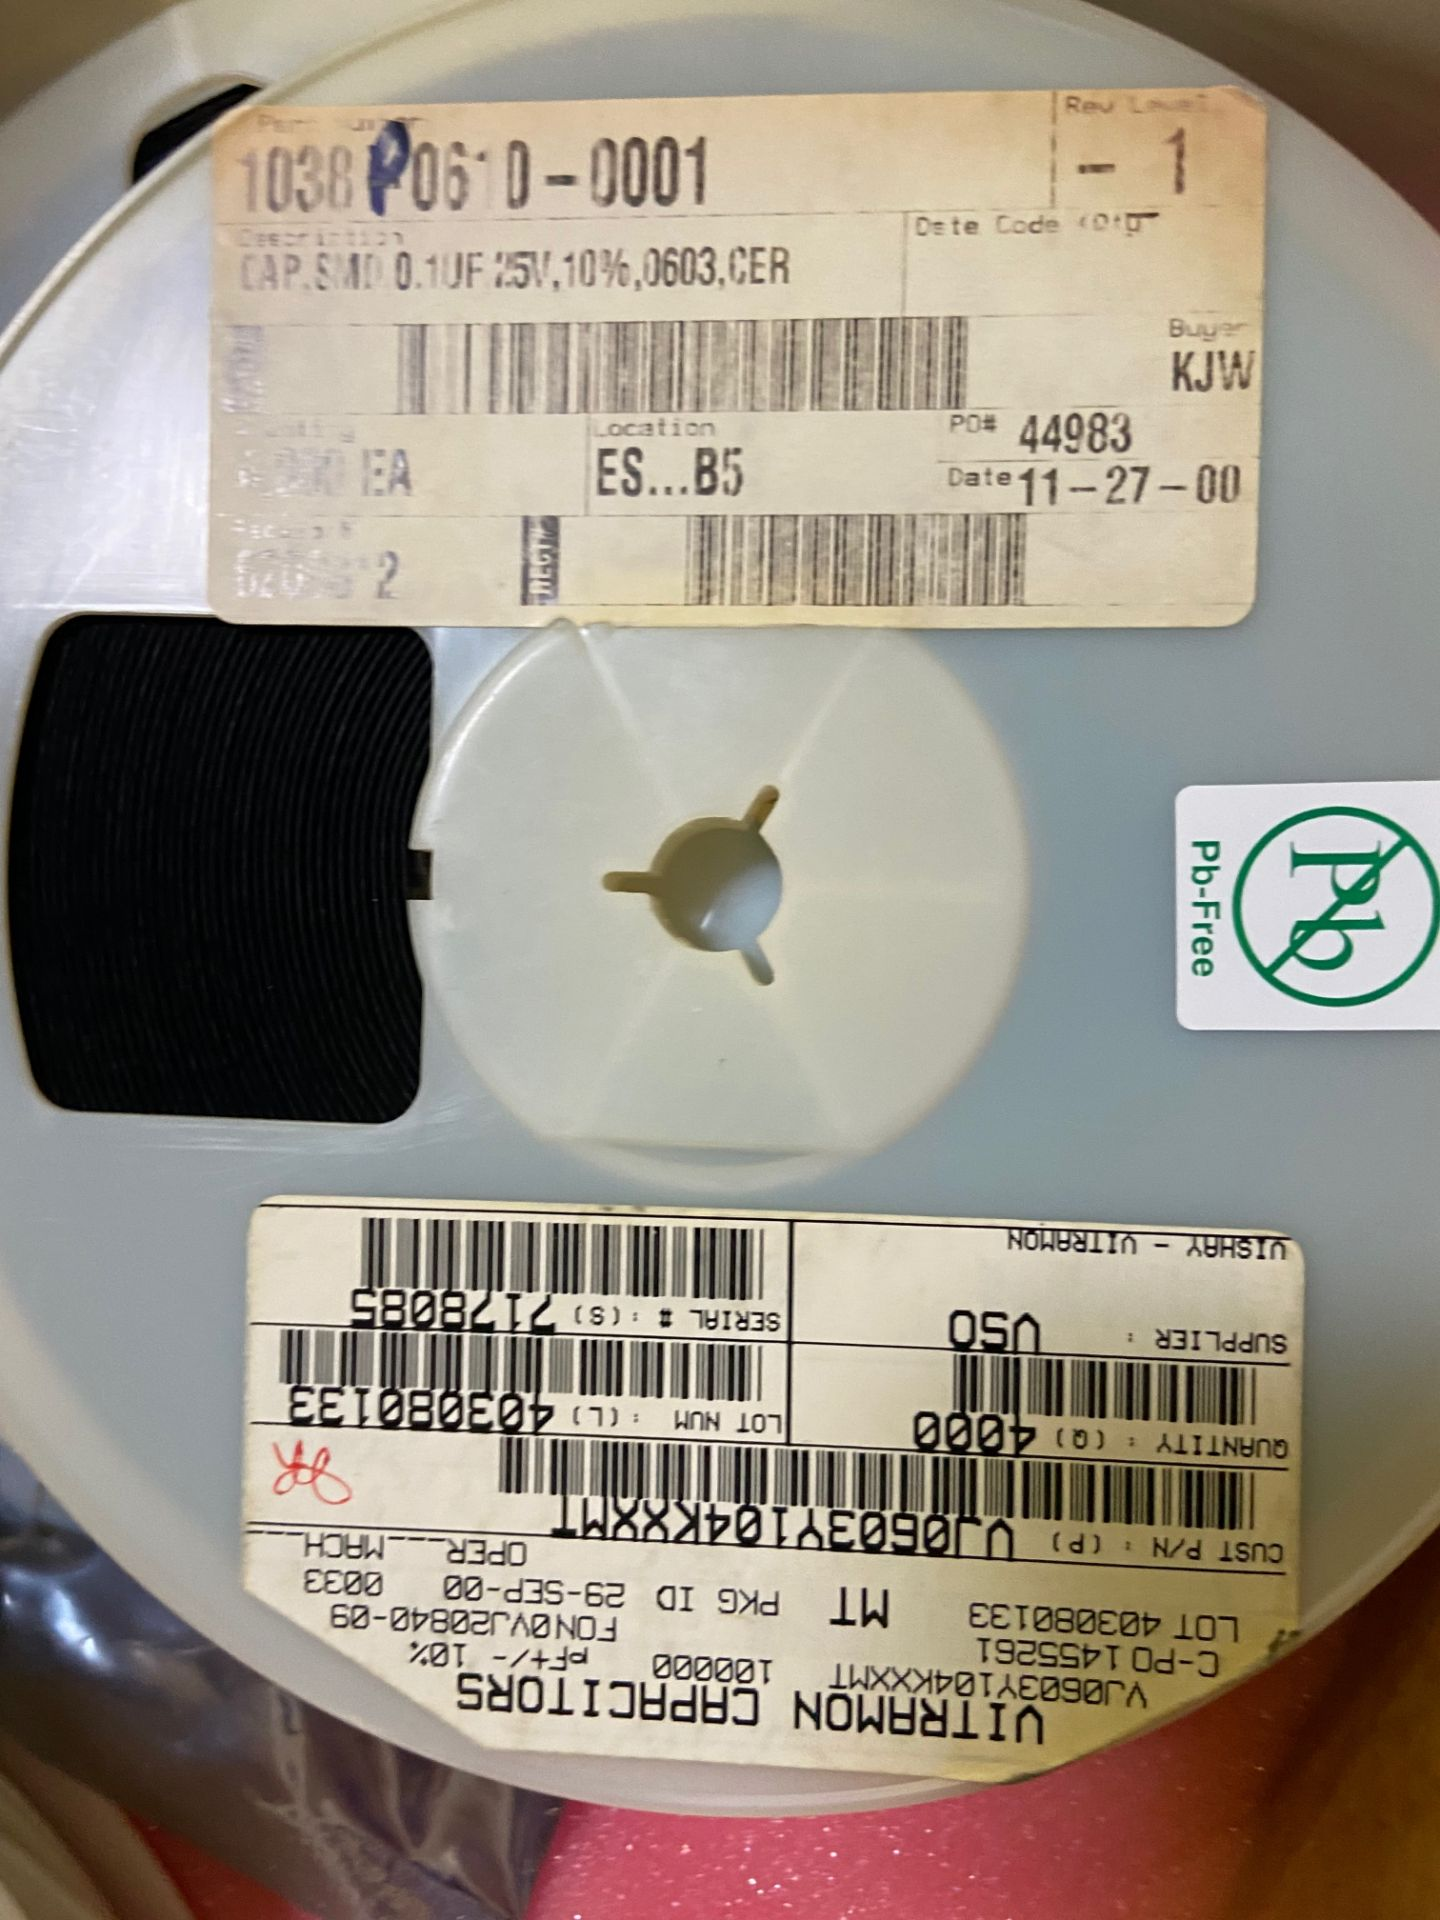 Vishay VJ0603Y104KXXMT, Cap Ceramic 0.1uF 25V X7R 10% Pad SMD 0603 150°C Automotive T/R, APROX QTY - Image 9 of 15